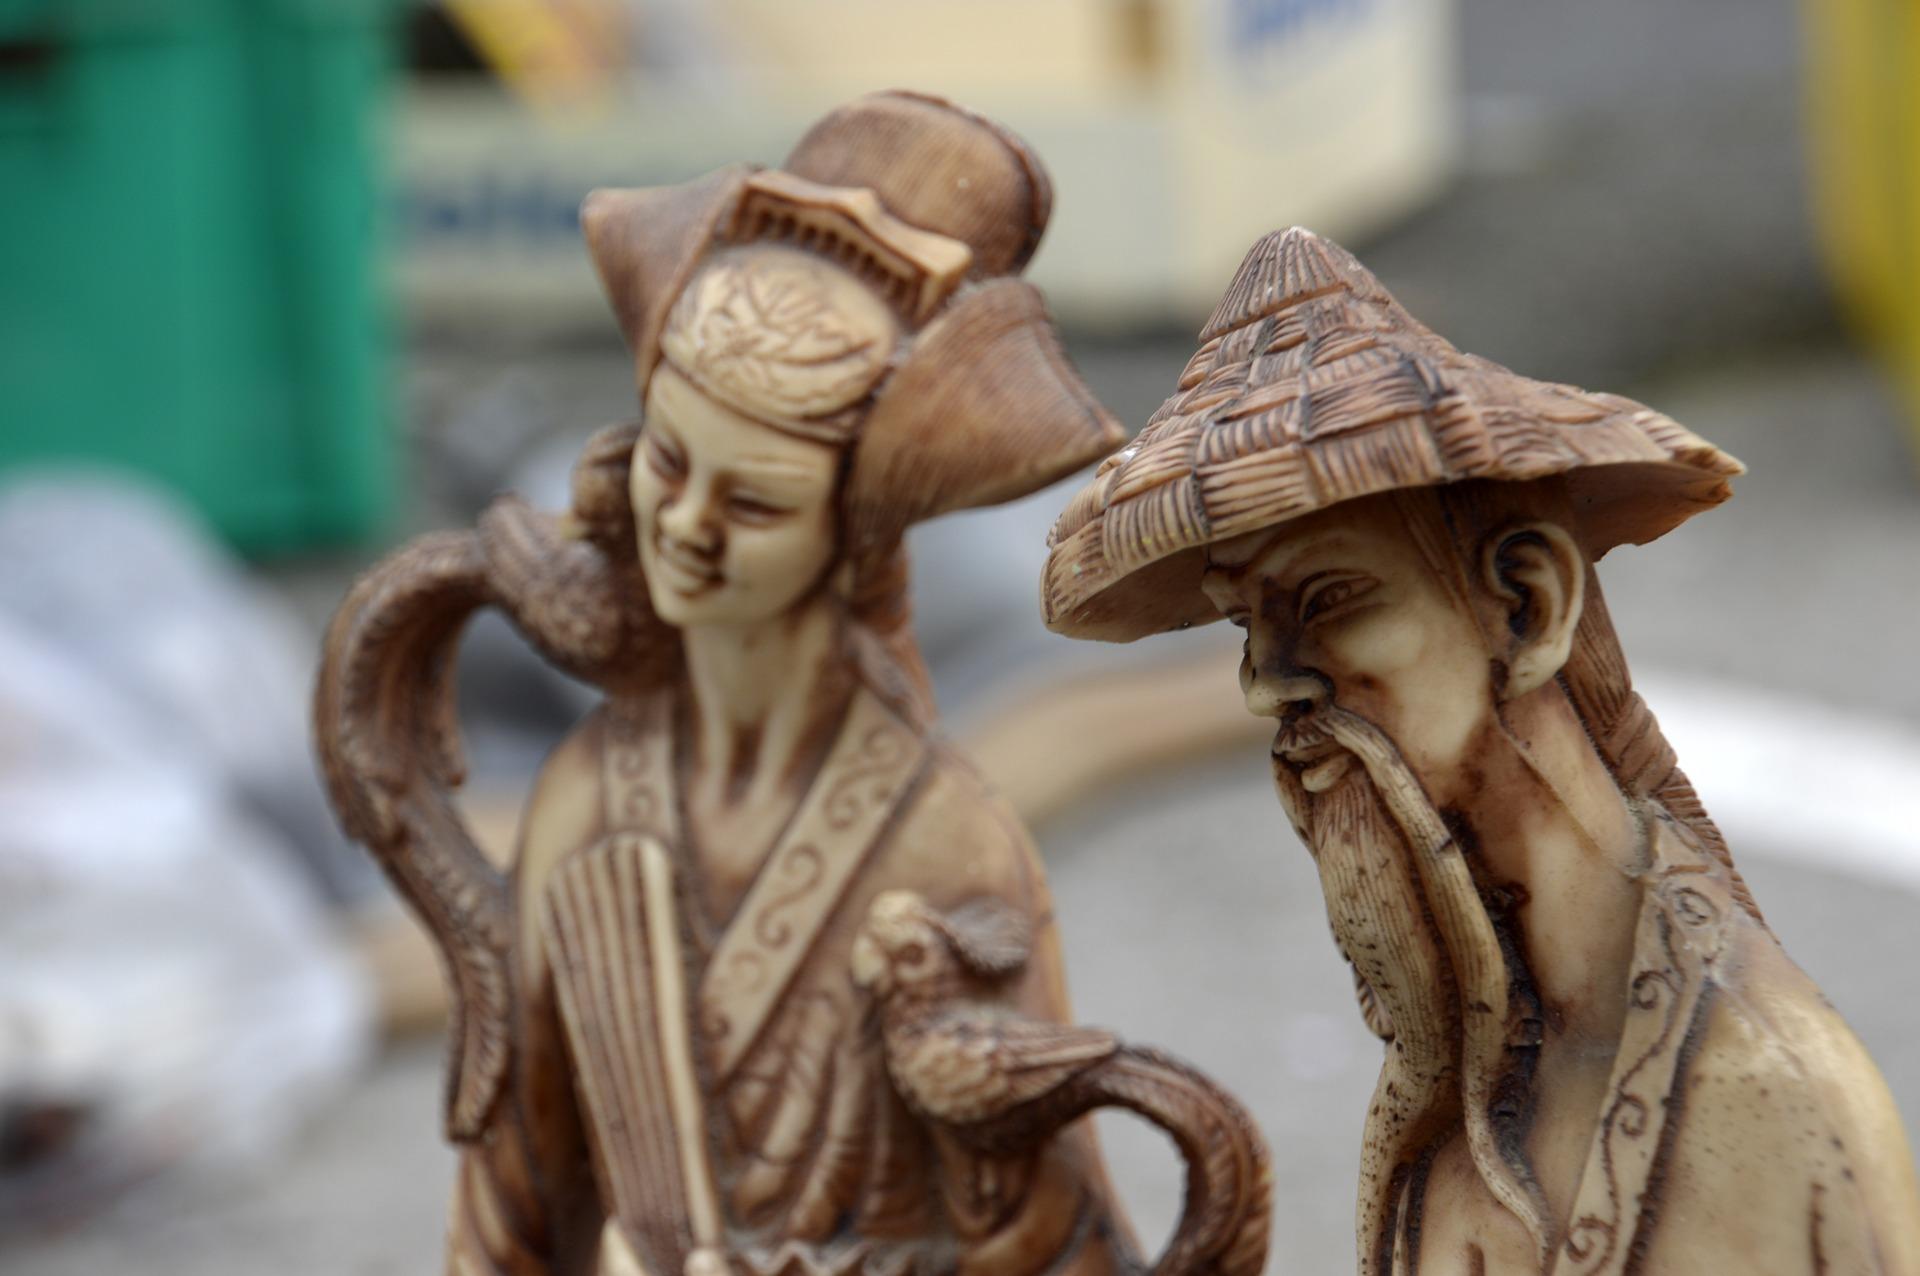 sculpture-chine-deco